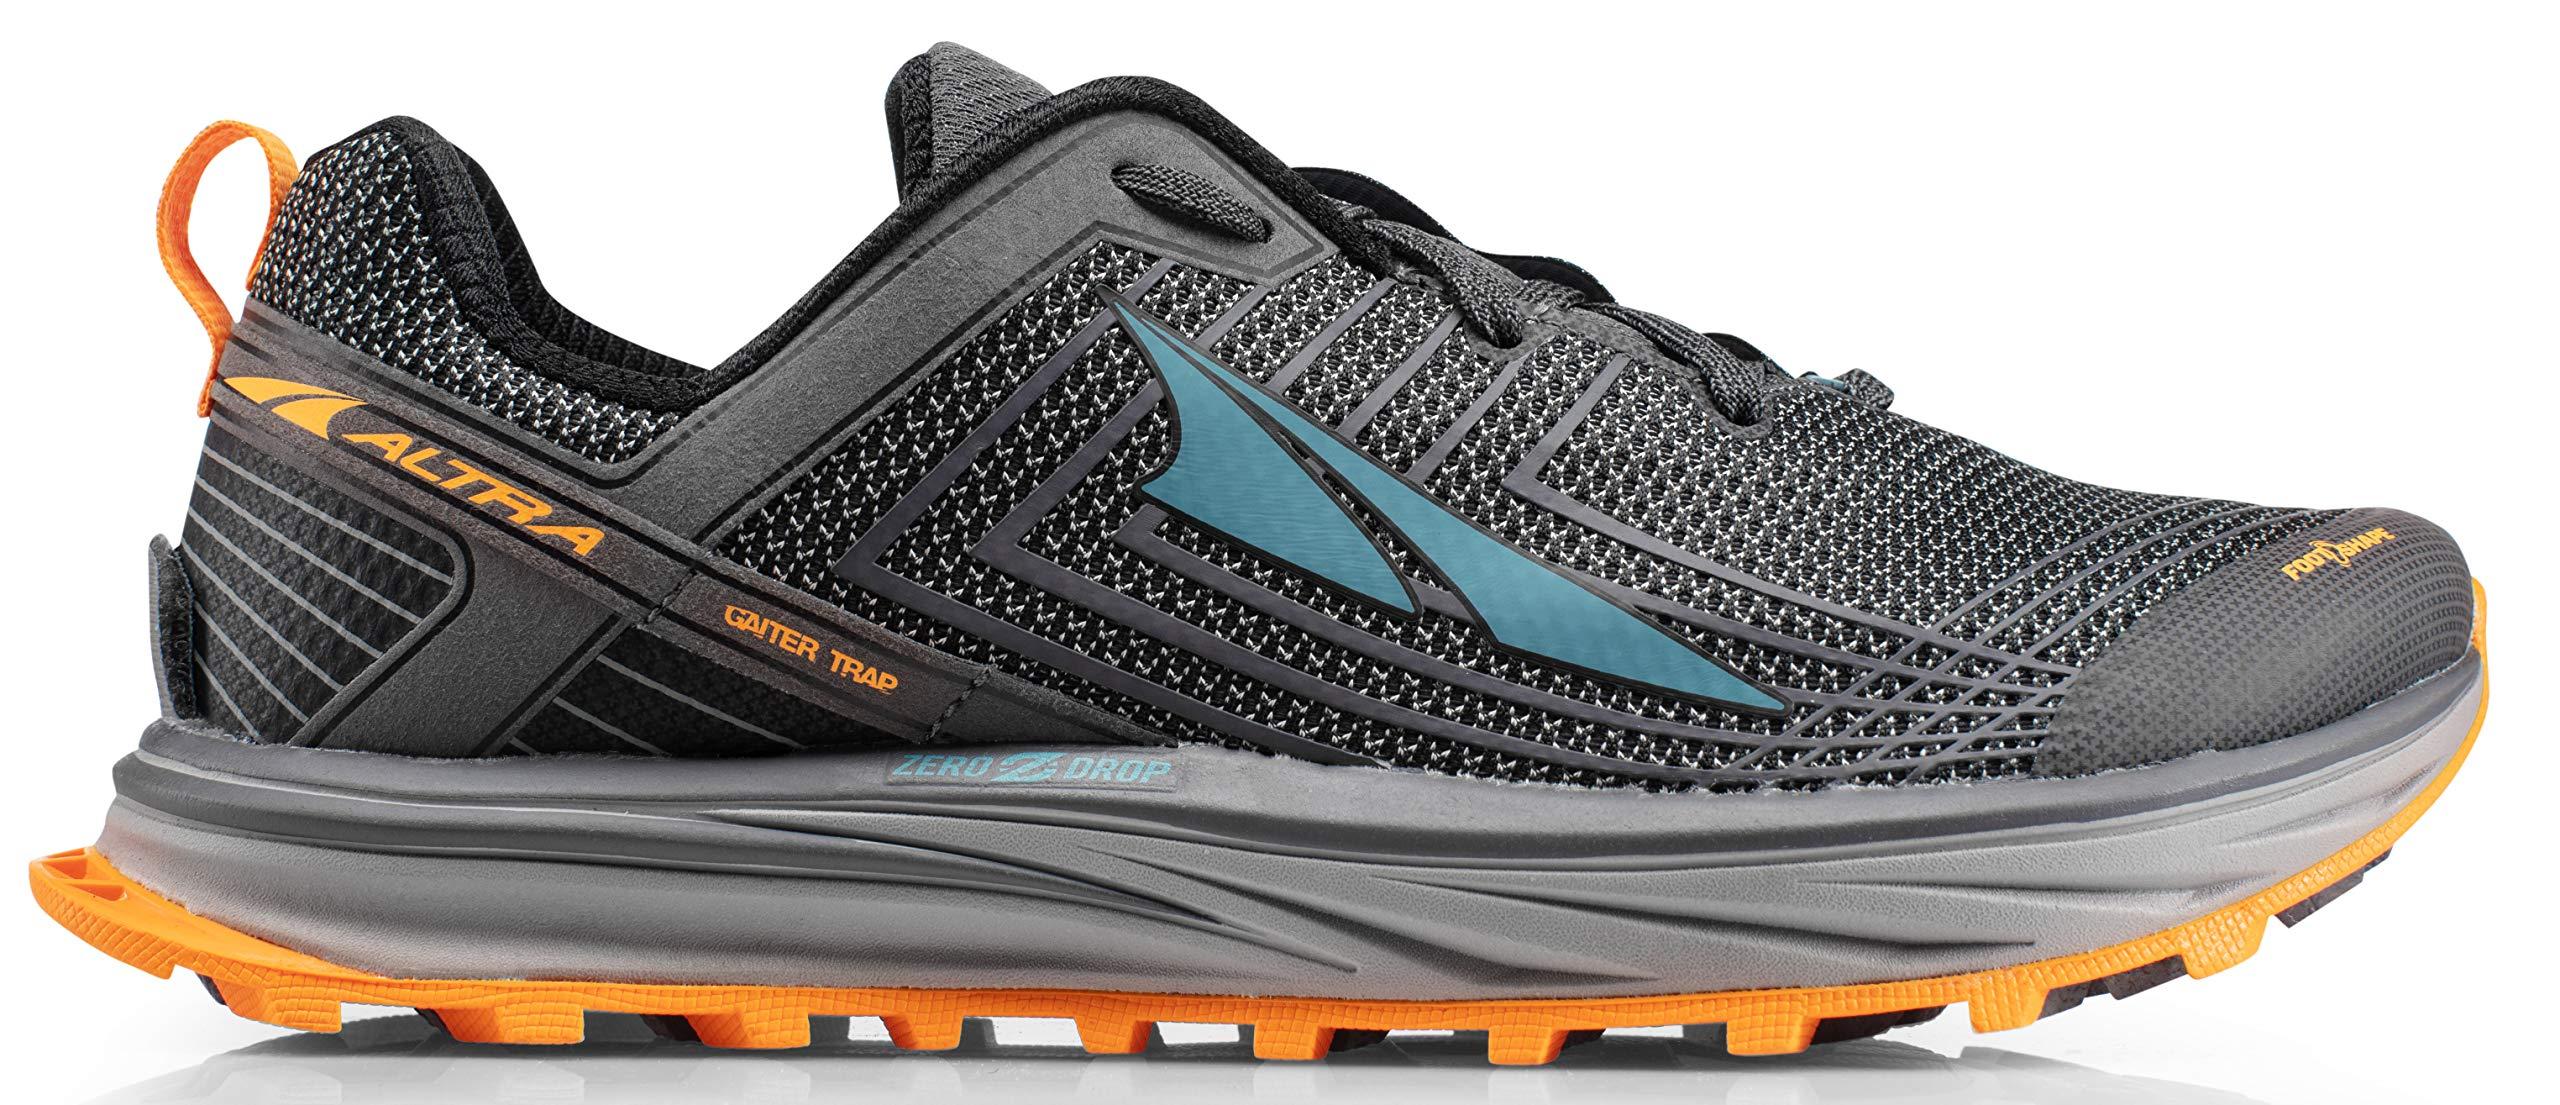 Altra AFM1957F Men's TIMP 1.5 Trail Running Shoe, Gray/Orange - 8 D(M) US